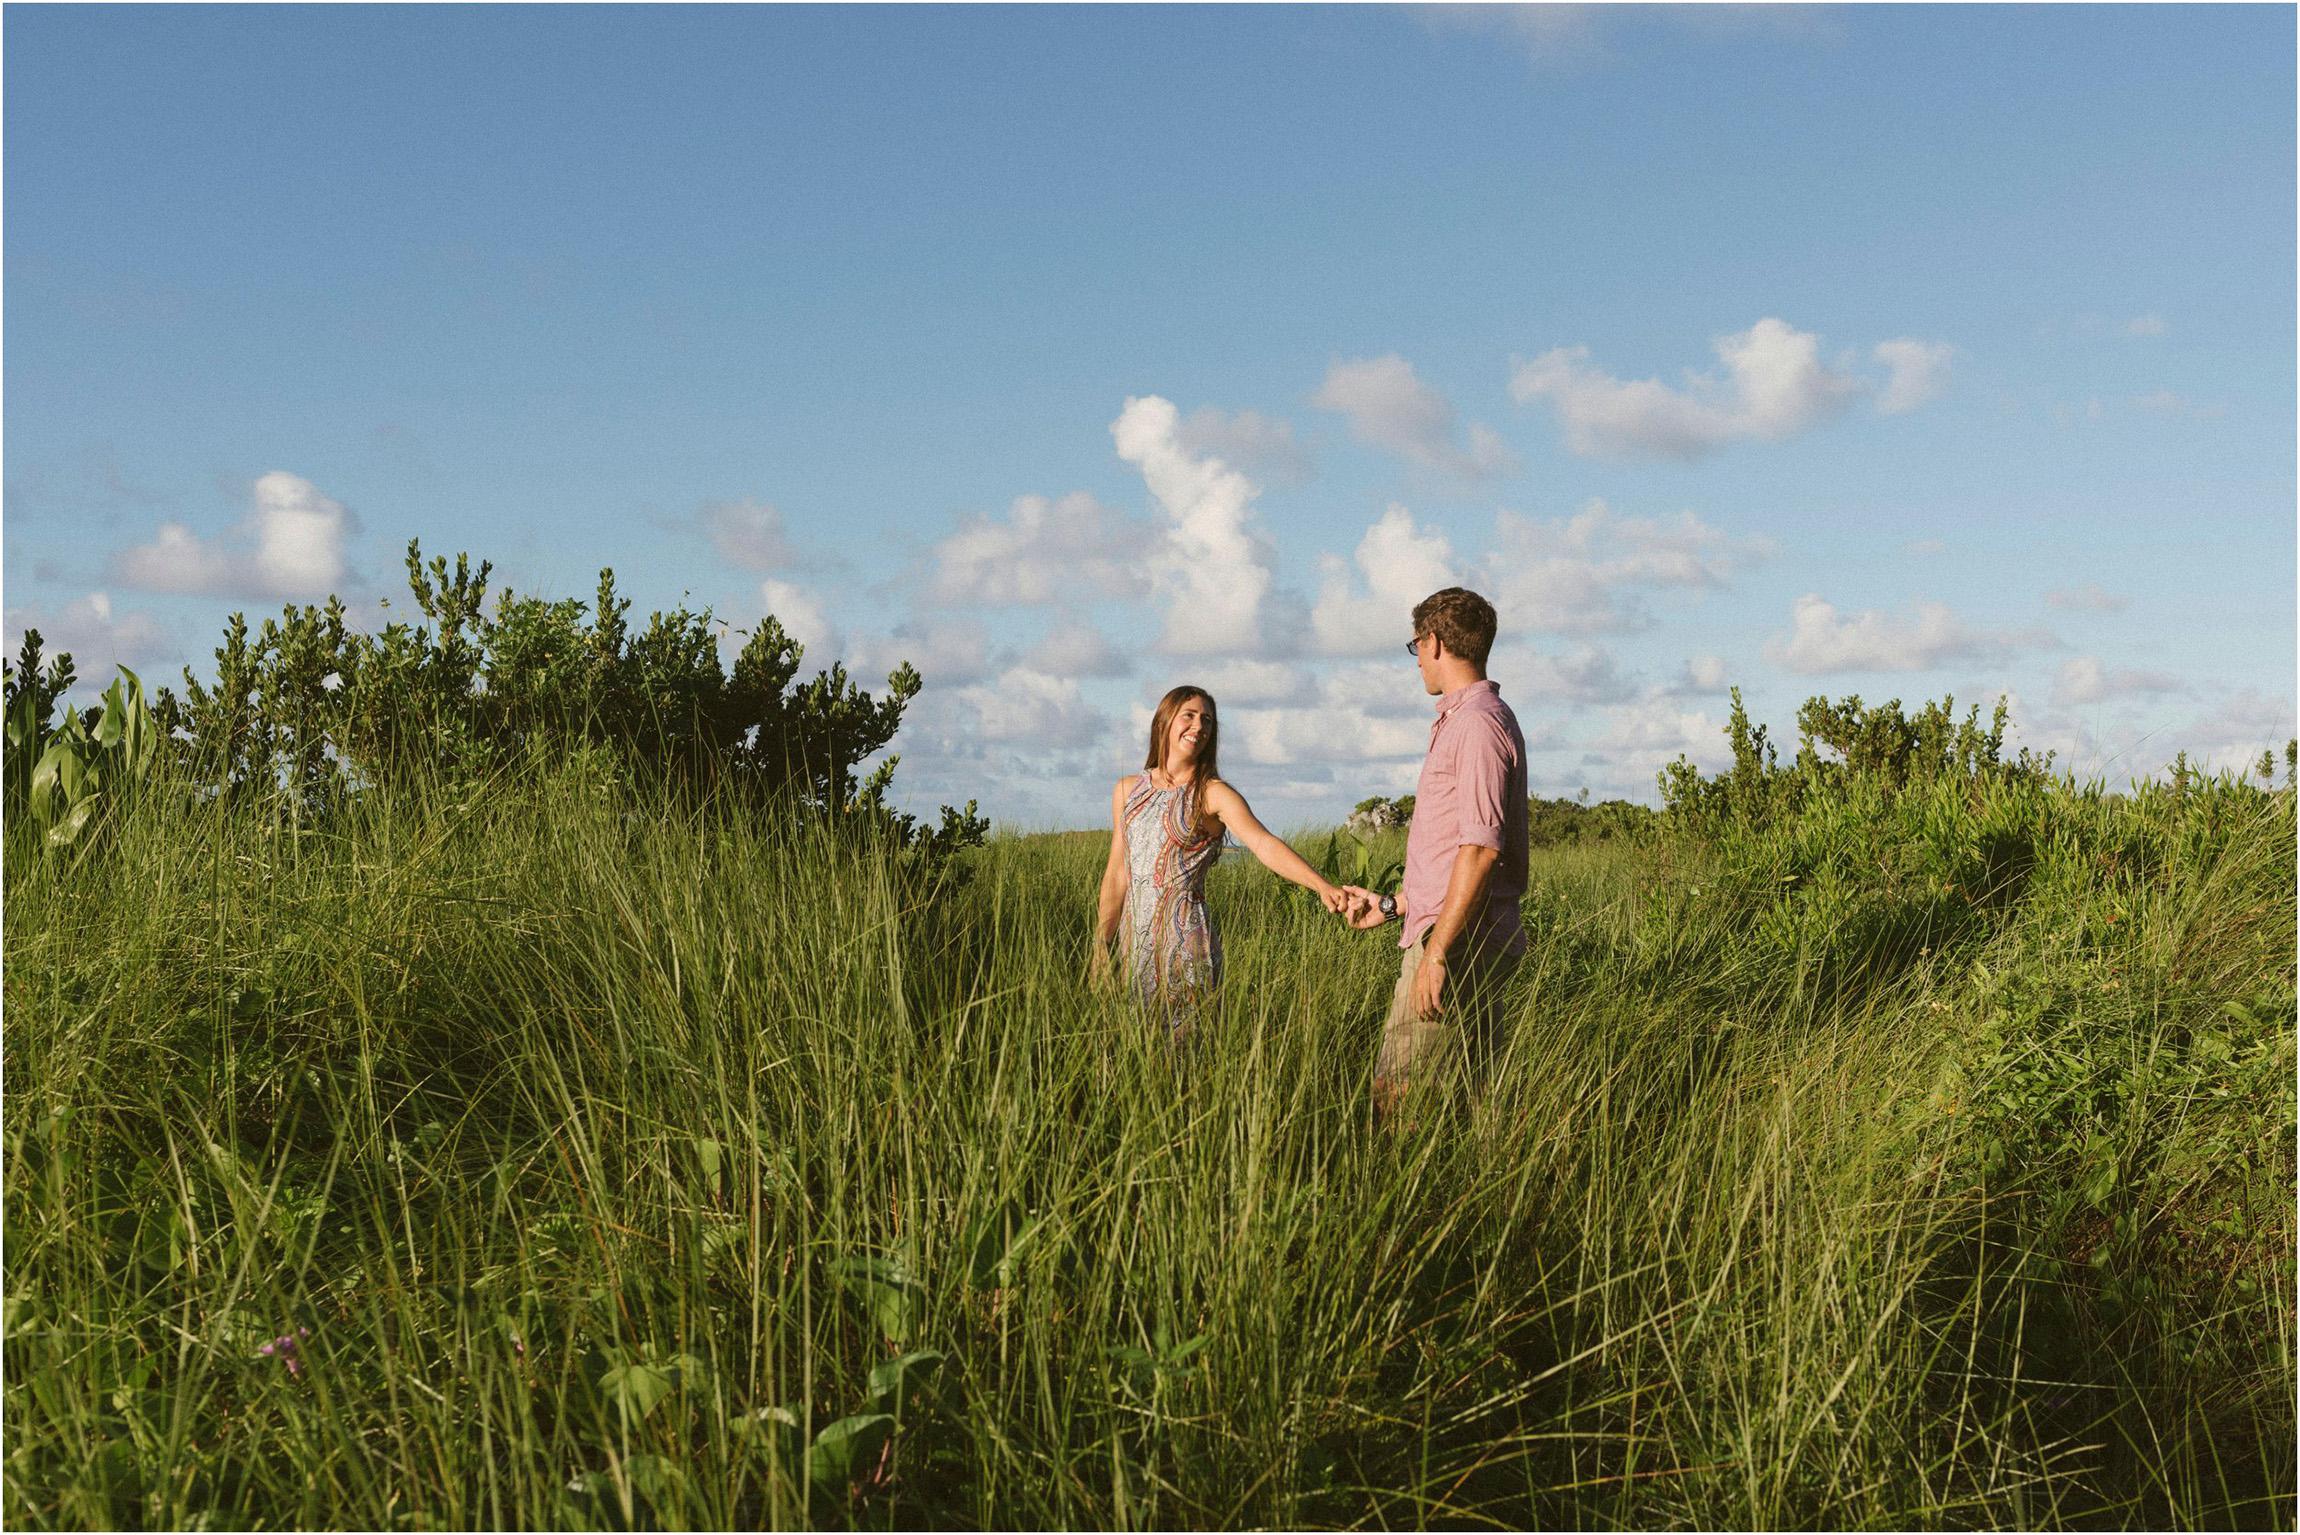 ©FianderFoto_Bermuda Engagement Photographer_Coopers Island_008.jpg